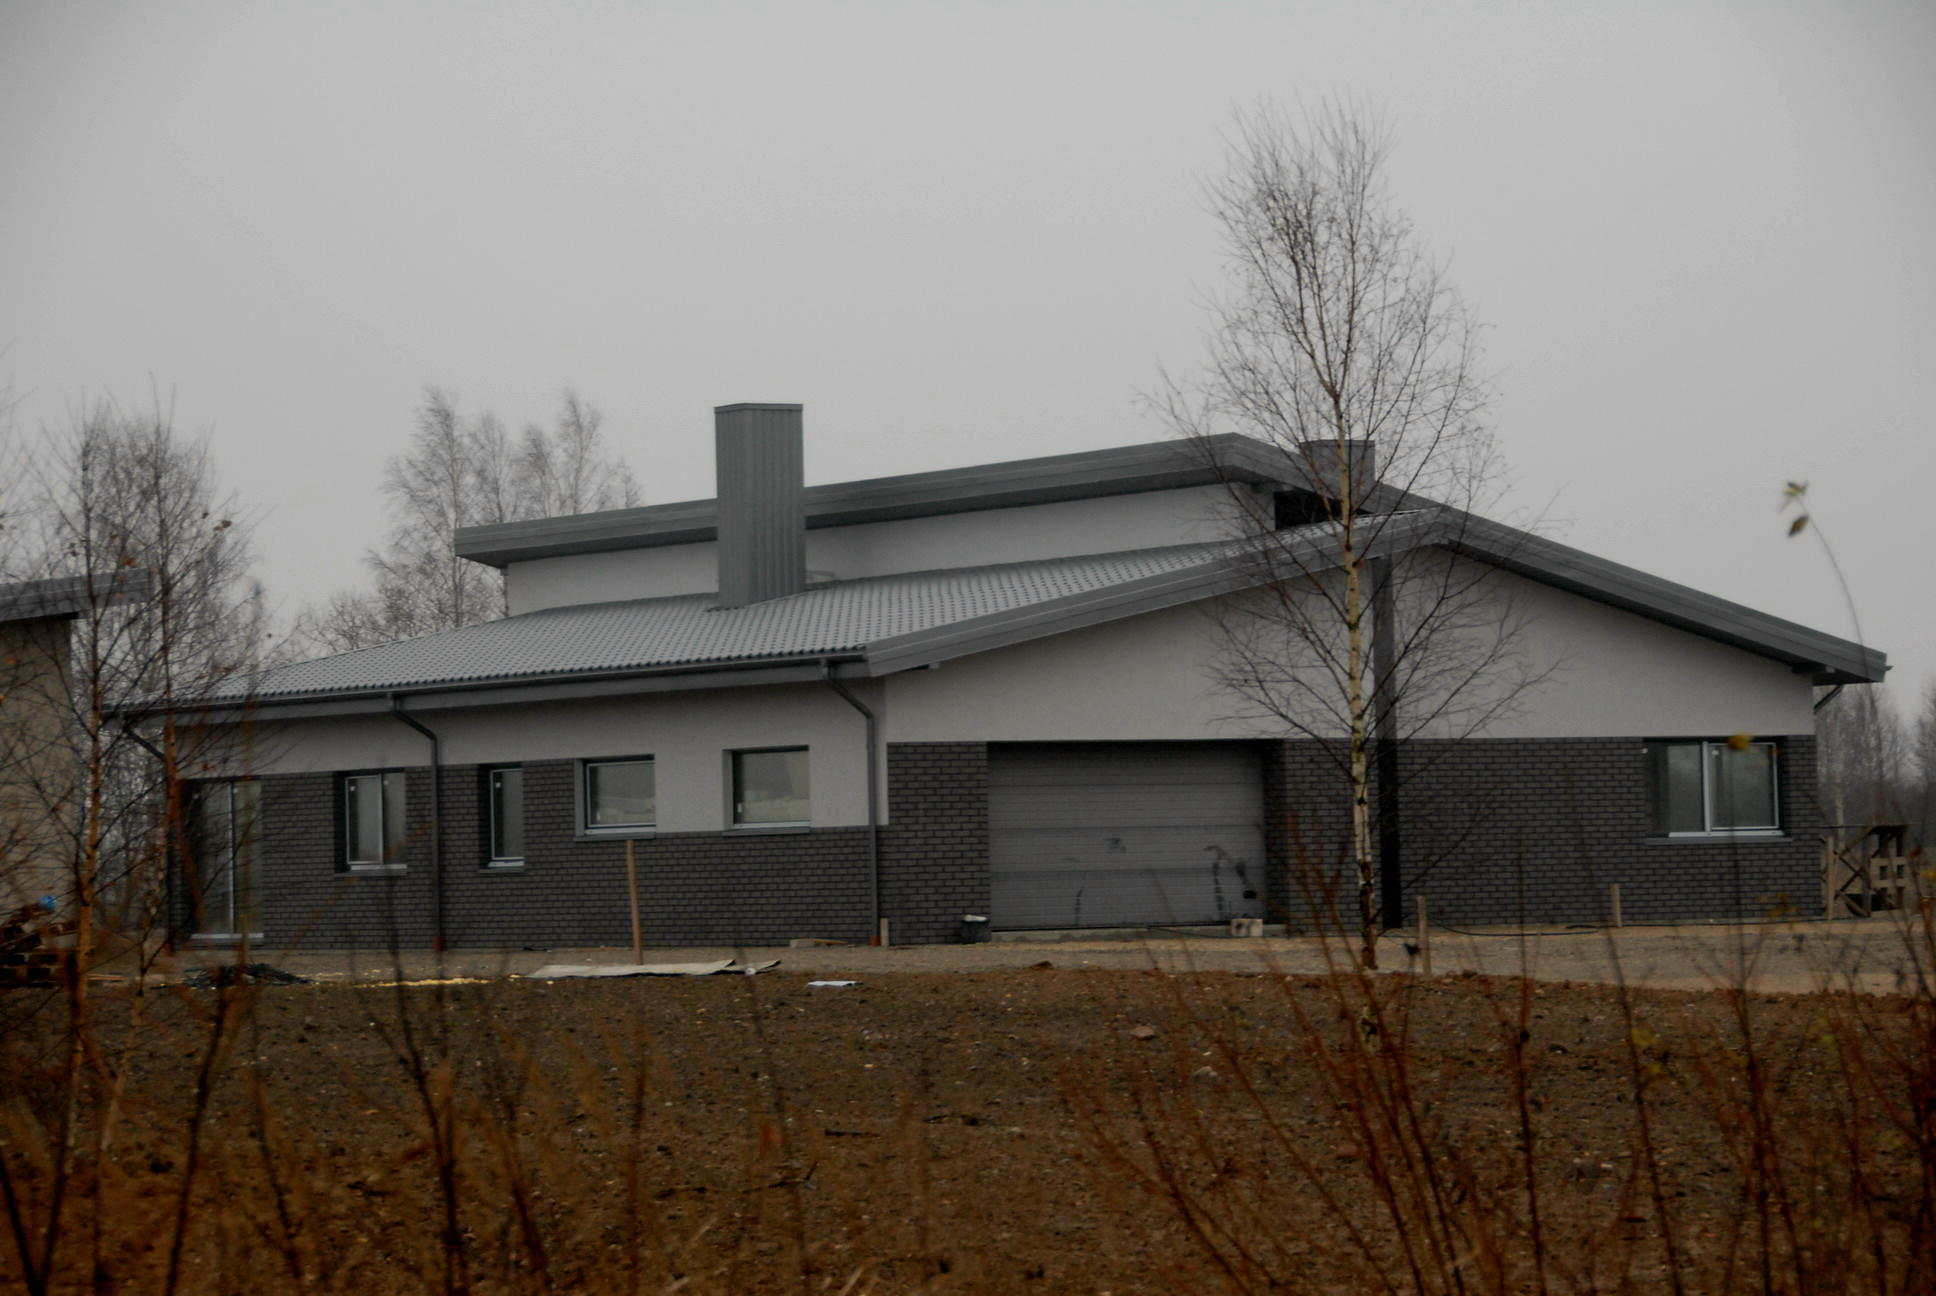 Feldhaus Klinker R735 Anthracit Mana 2